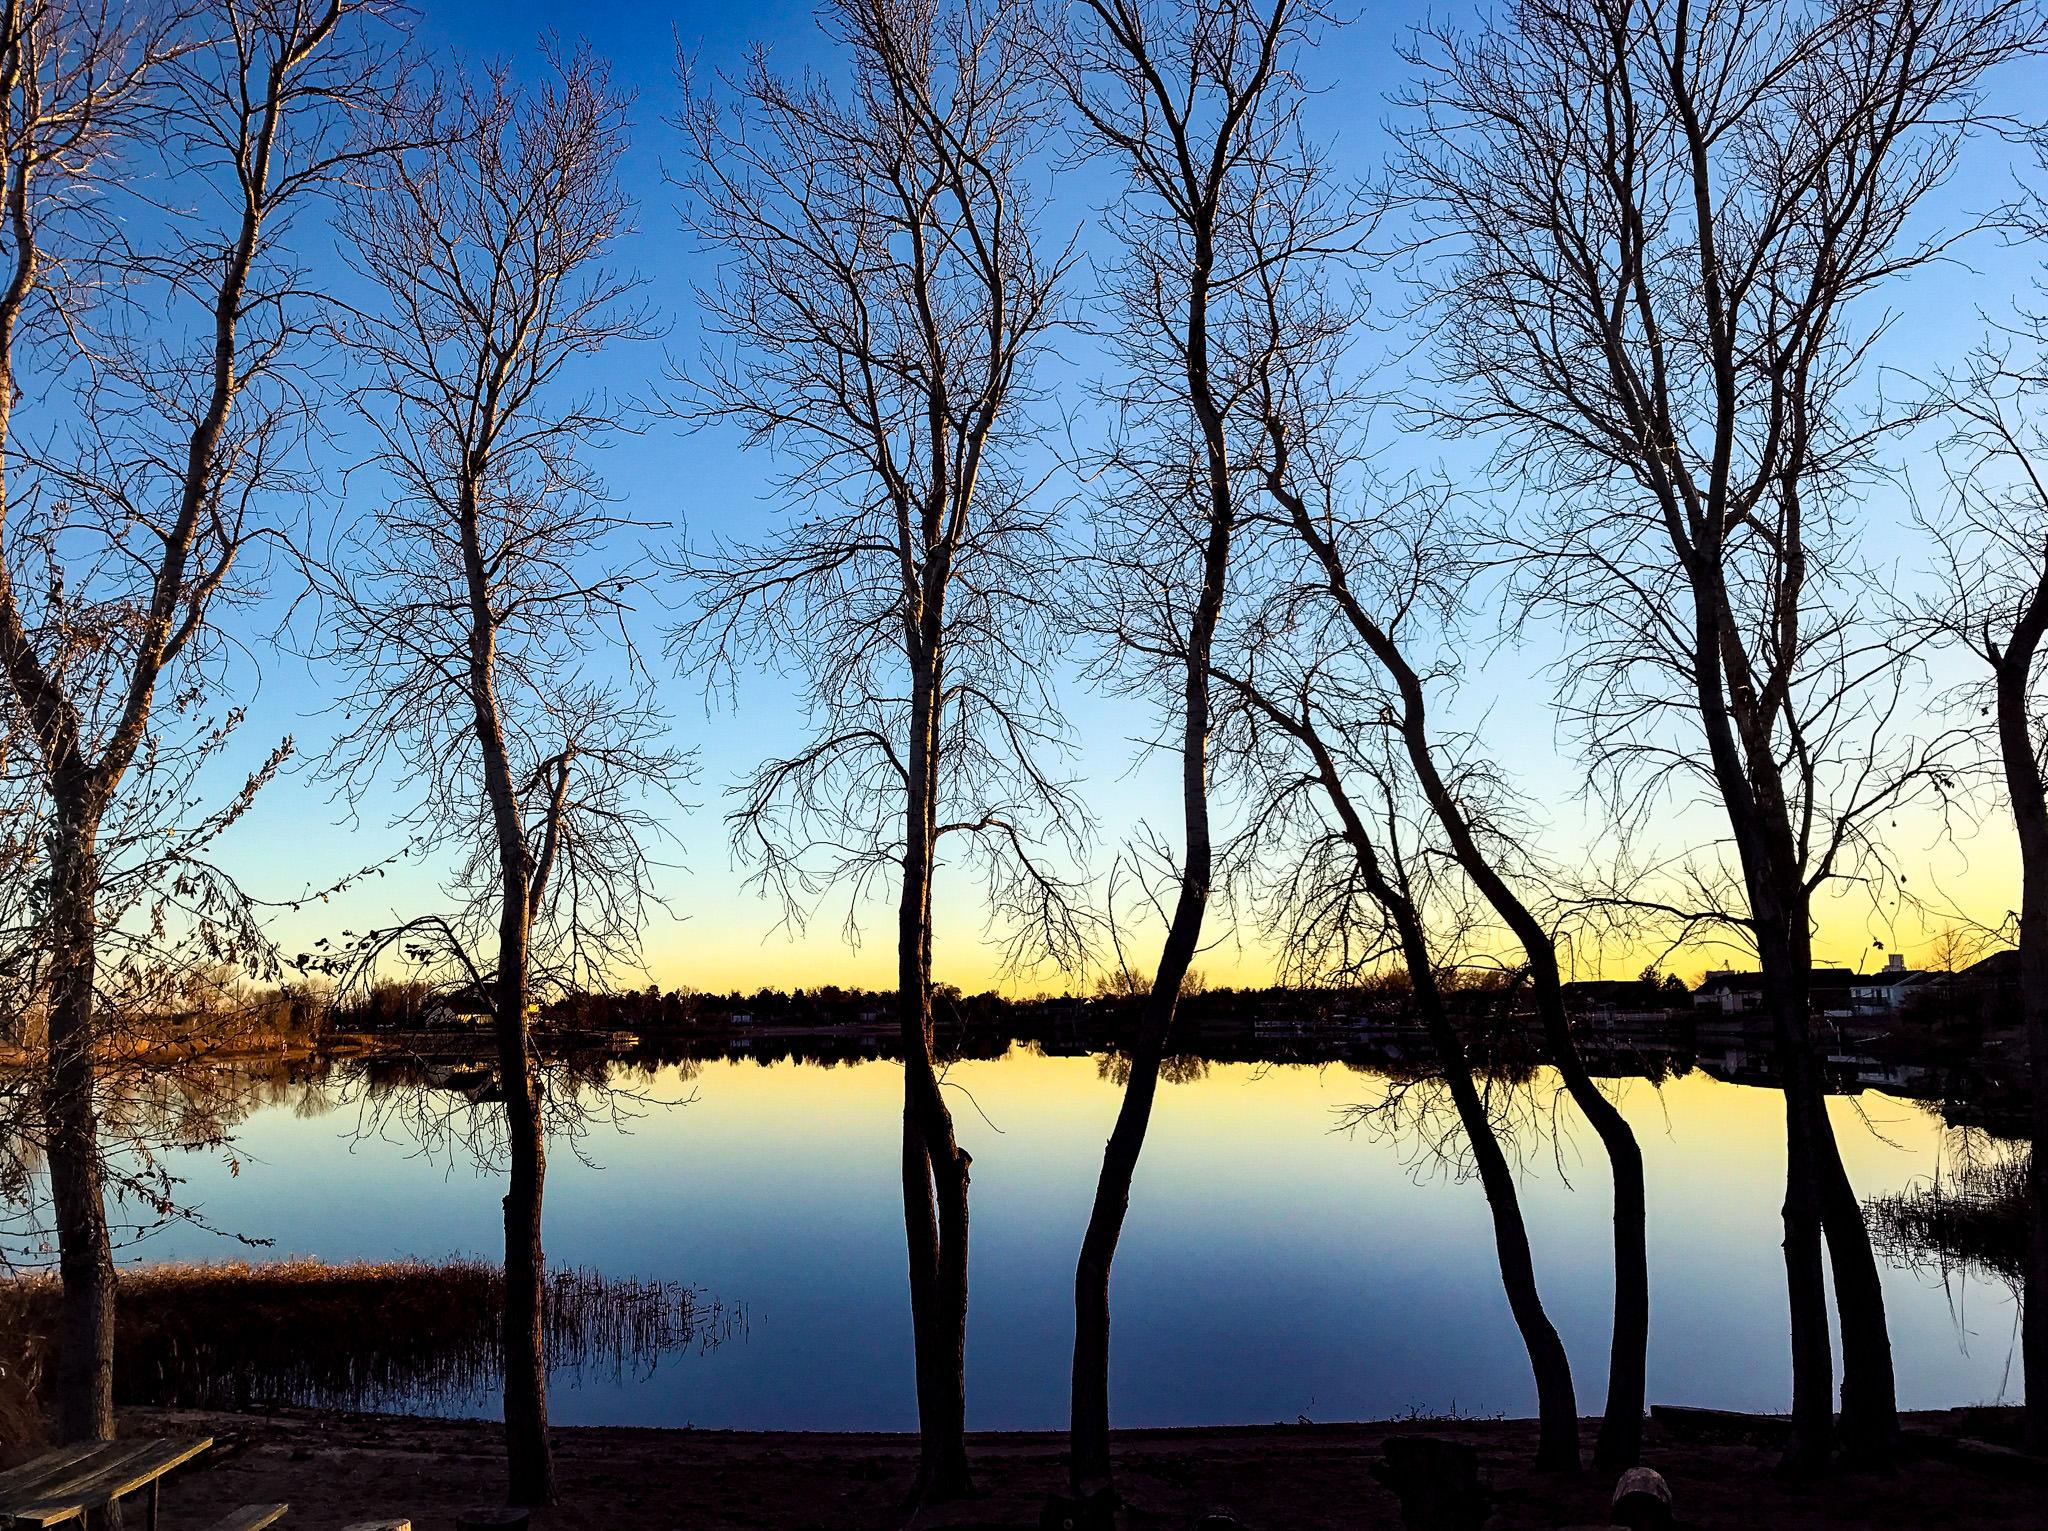 Sunset at Emerald Lake